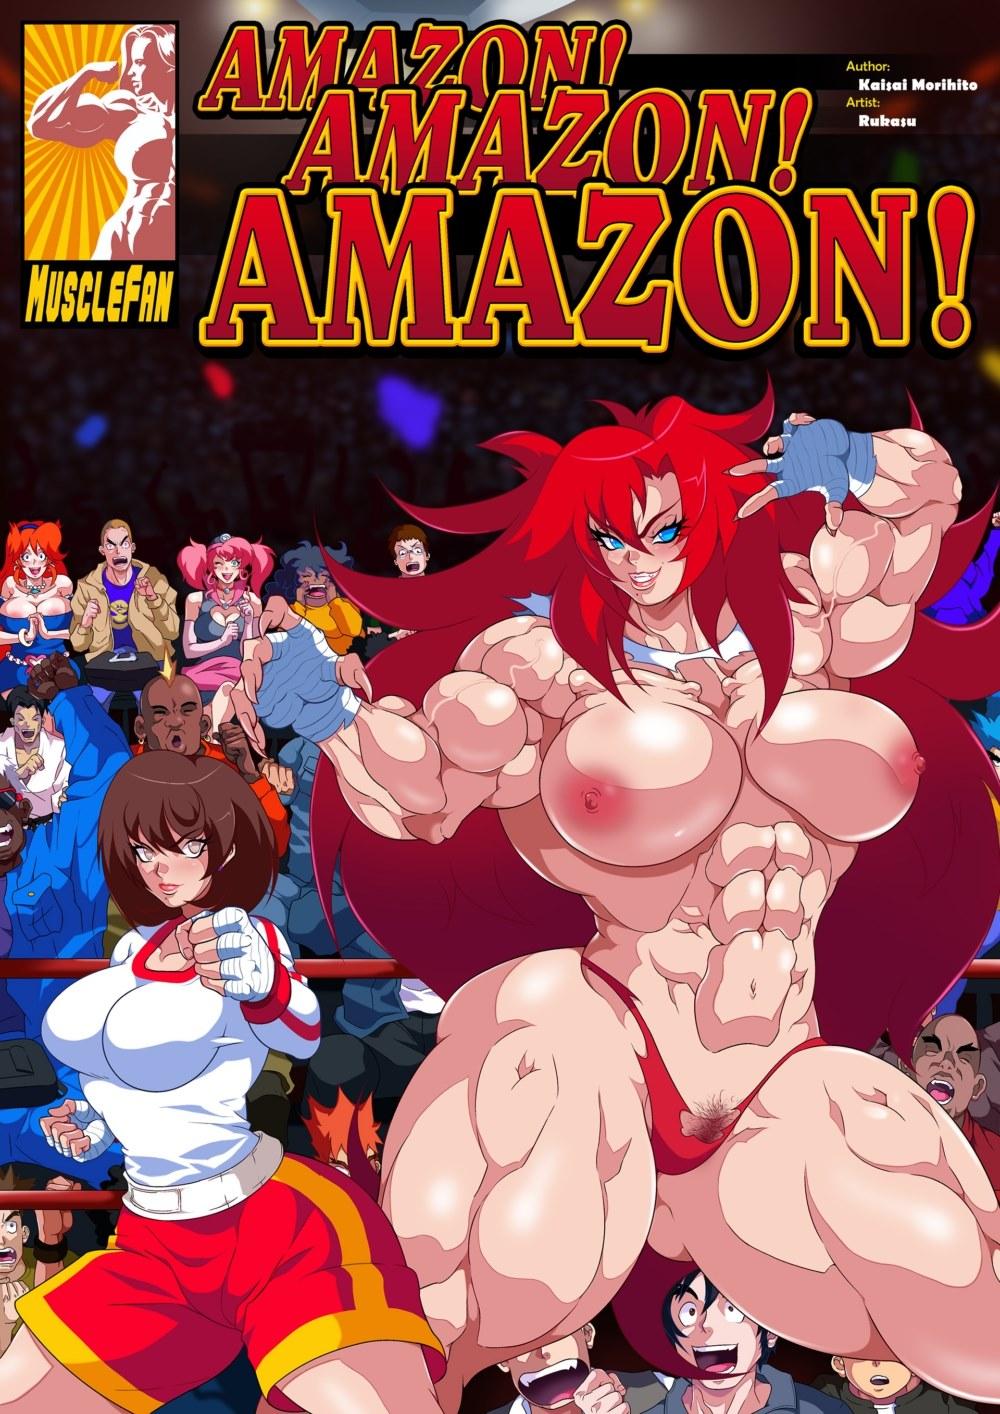 Amazon-Amazon-Amazon porn comics 8 muses